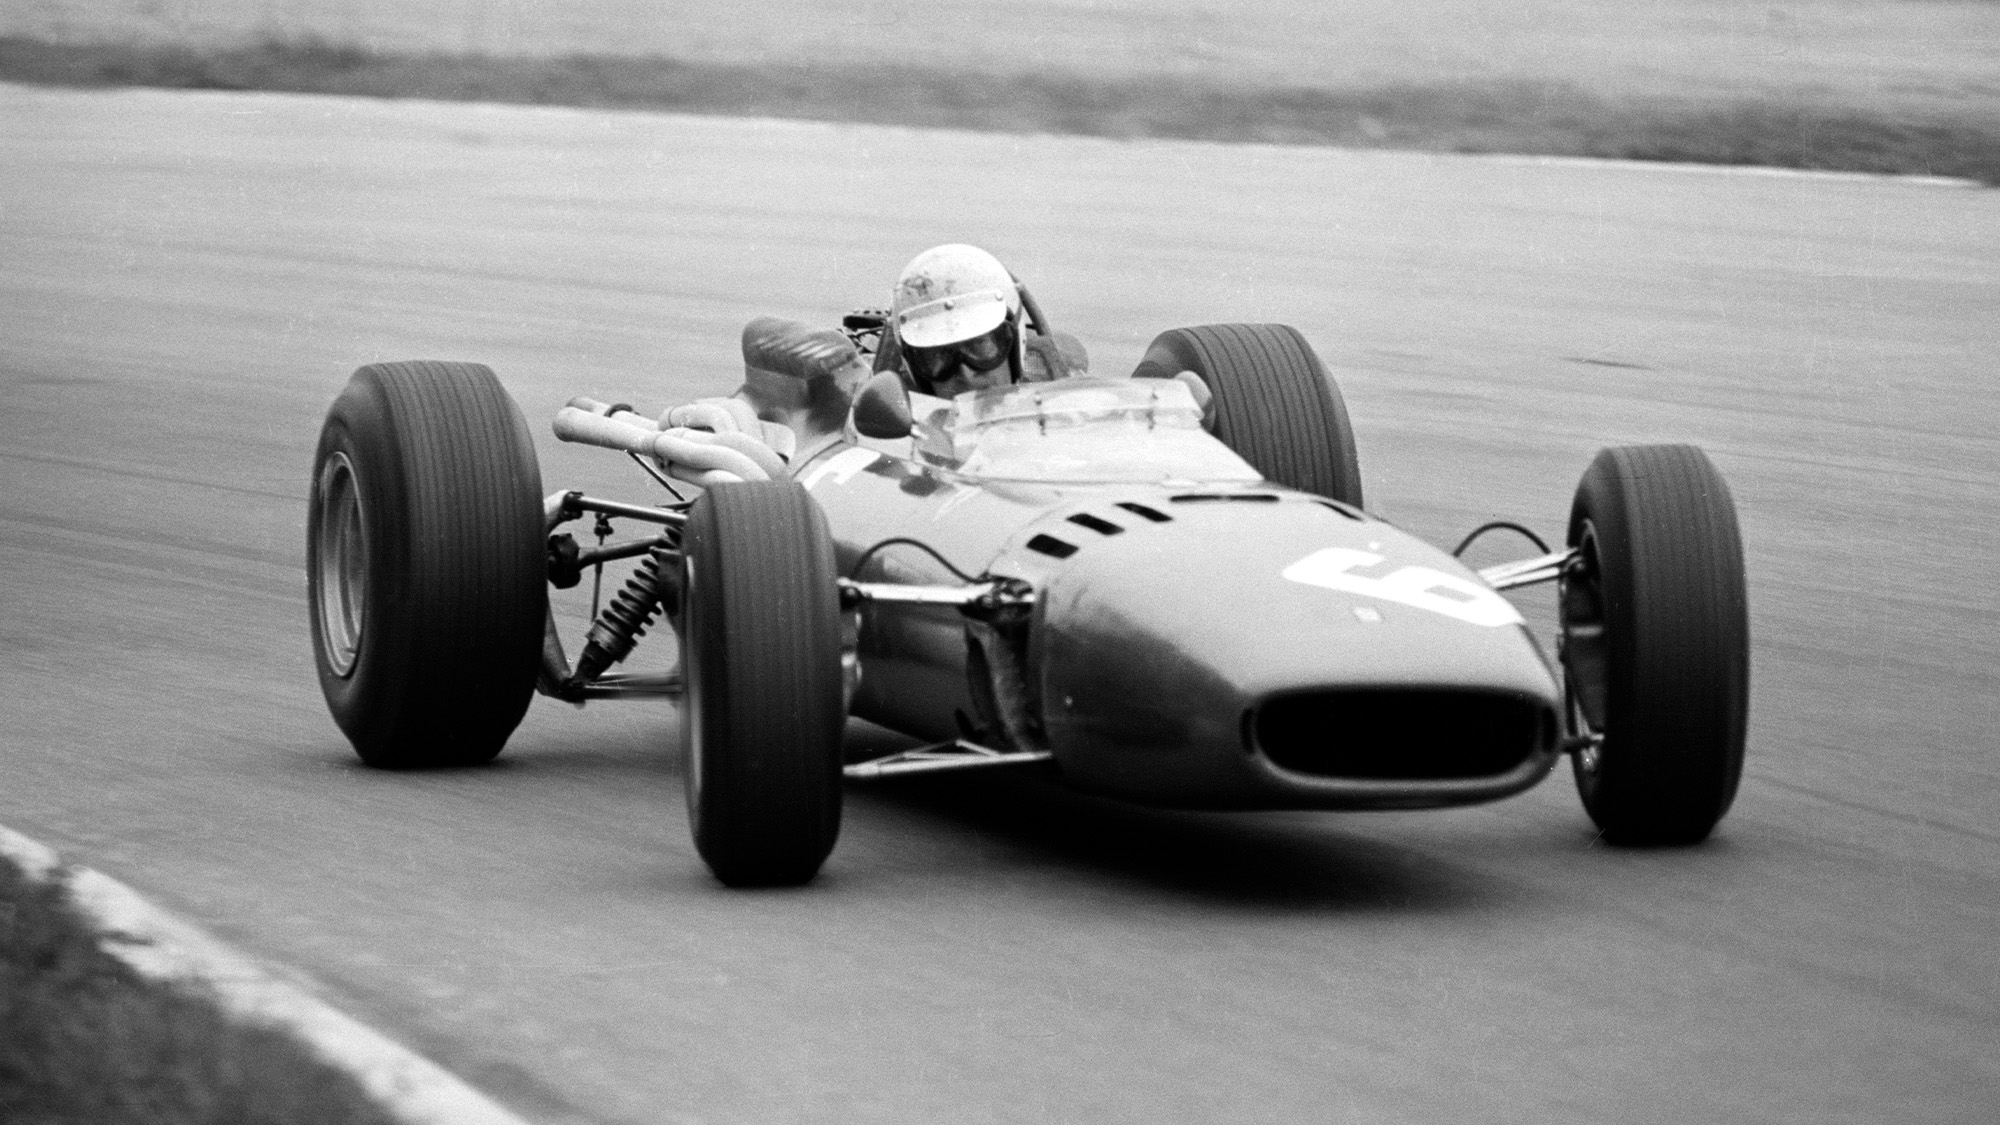 Ludovico Scarfiotti on his way to winning the 1966 Italian Grand Prix at Monza